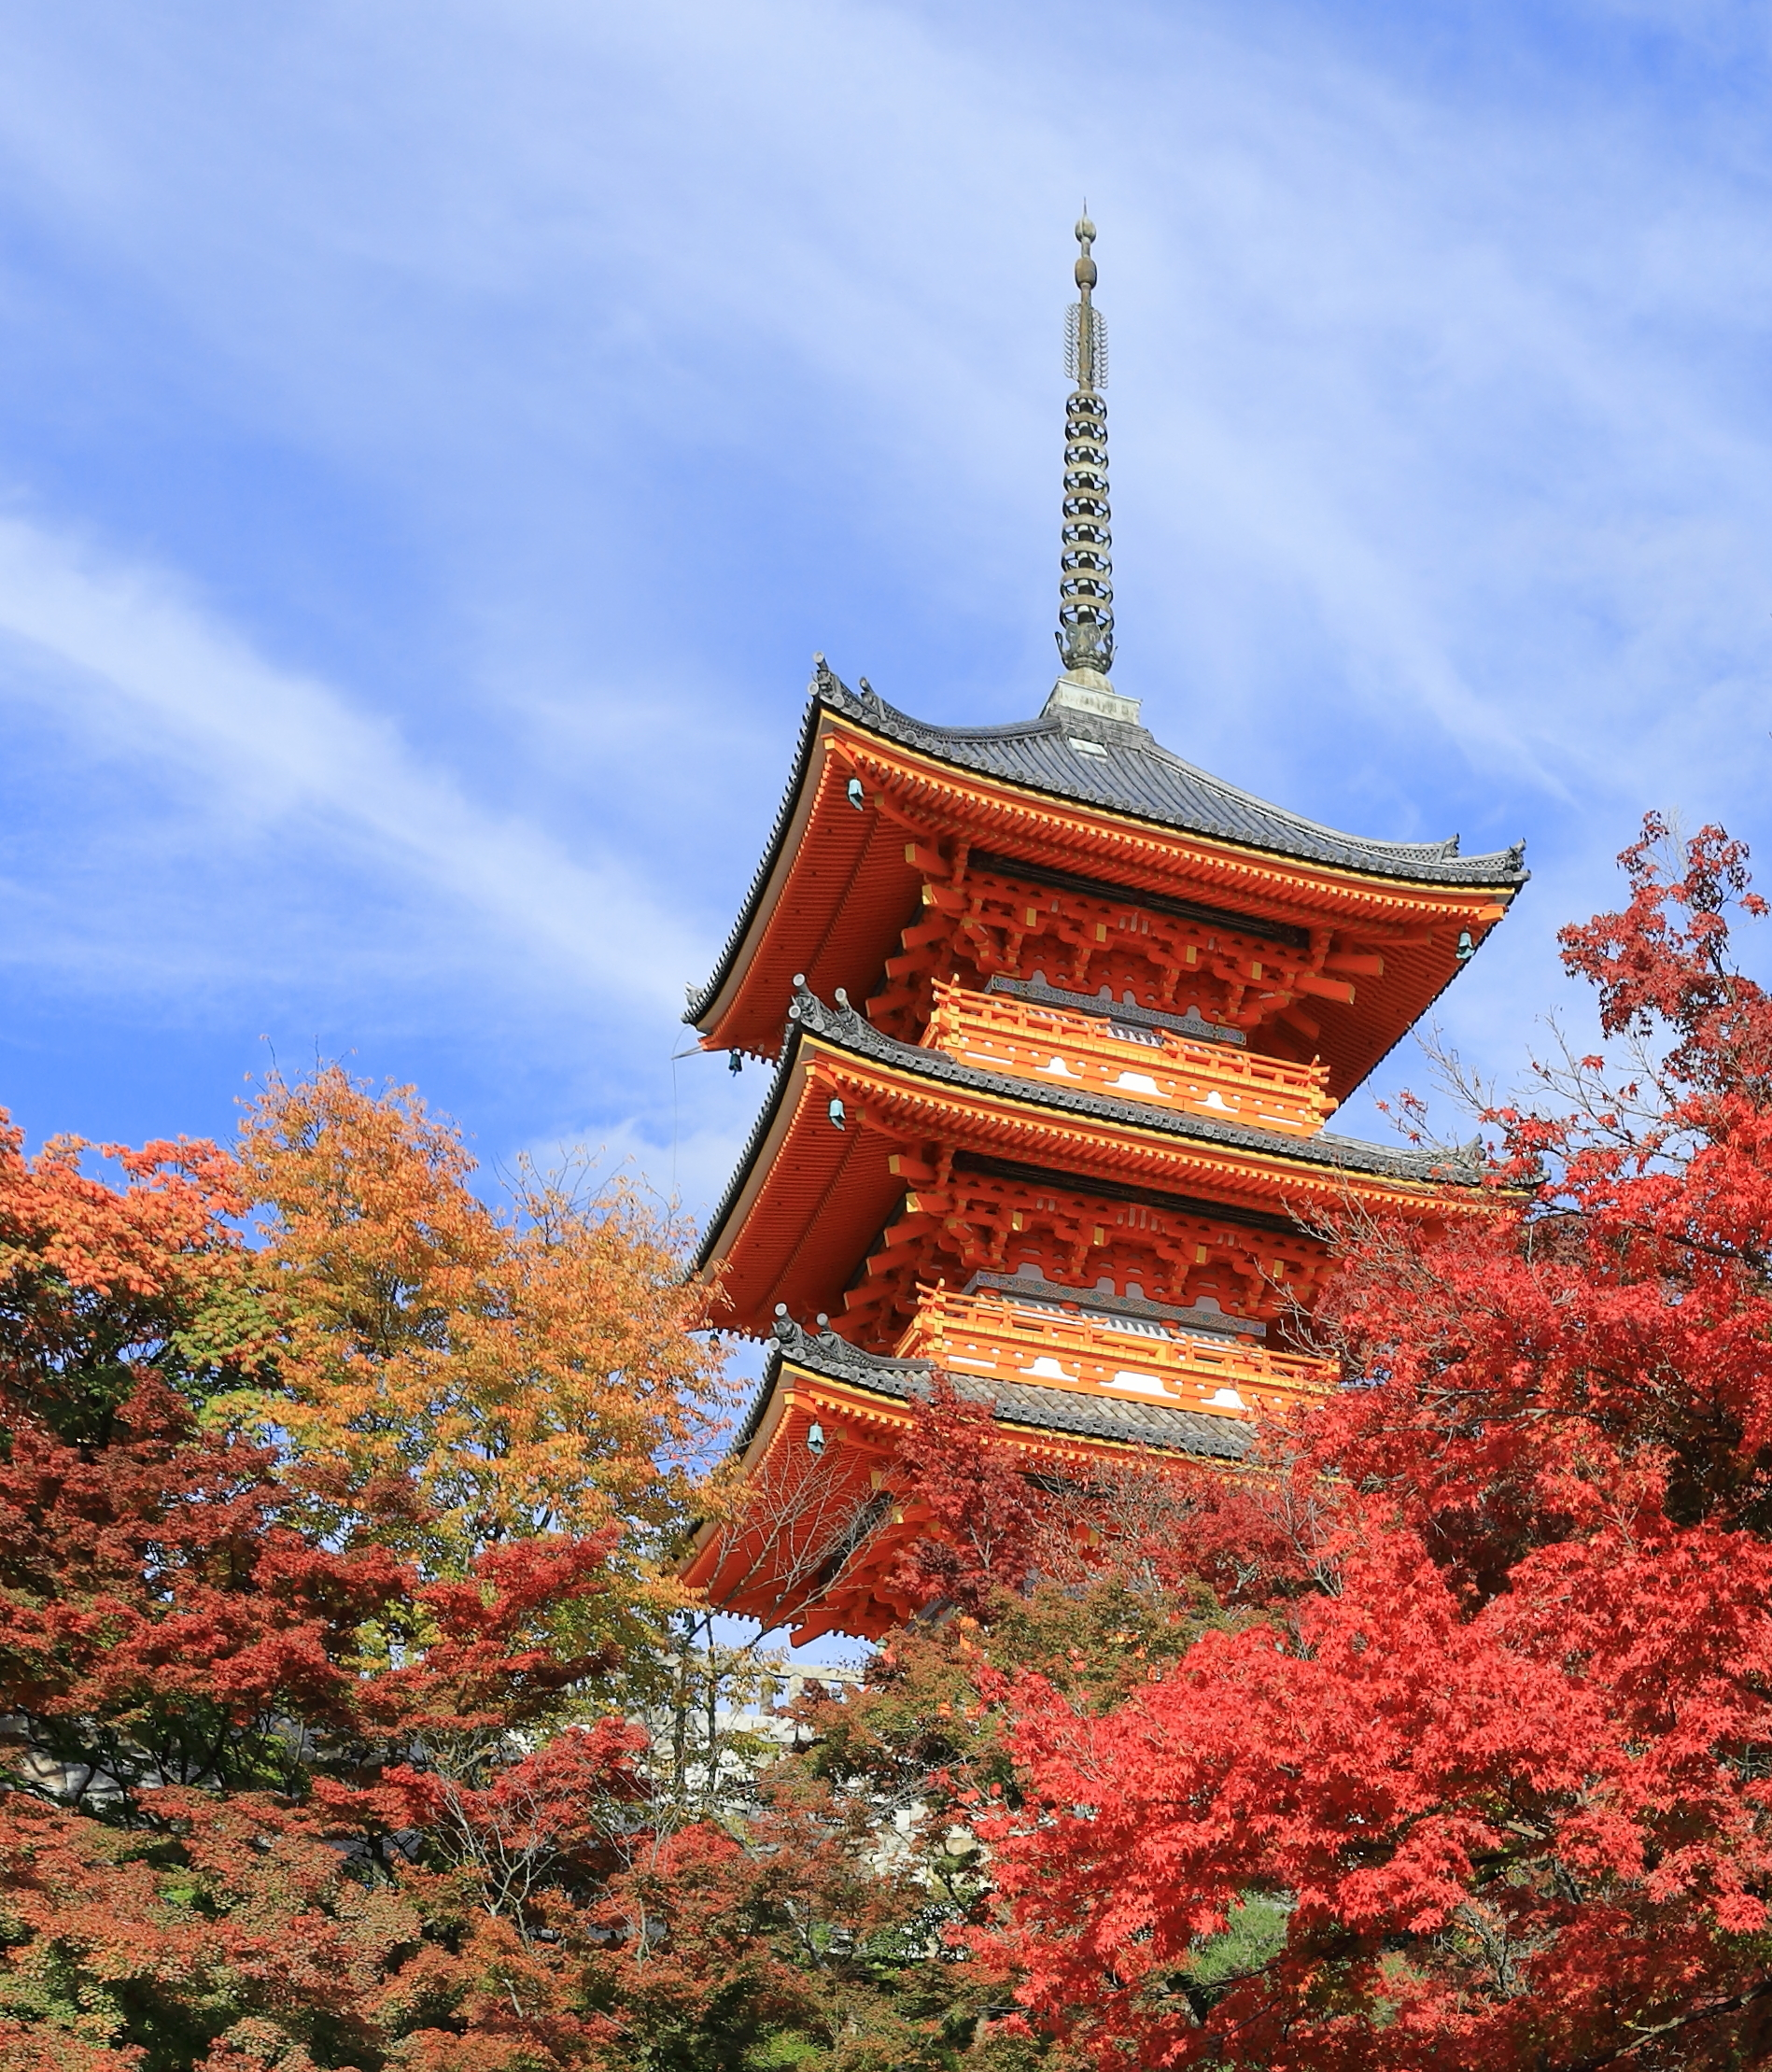 [Resim: Kiyomizu-dera%2C_Kyoto%2C_November_2016_-04.jpg]